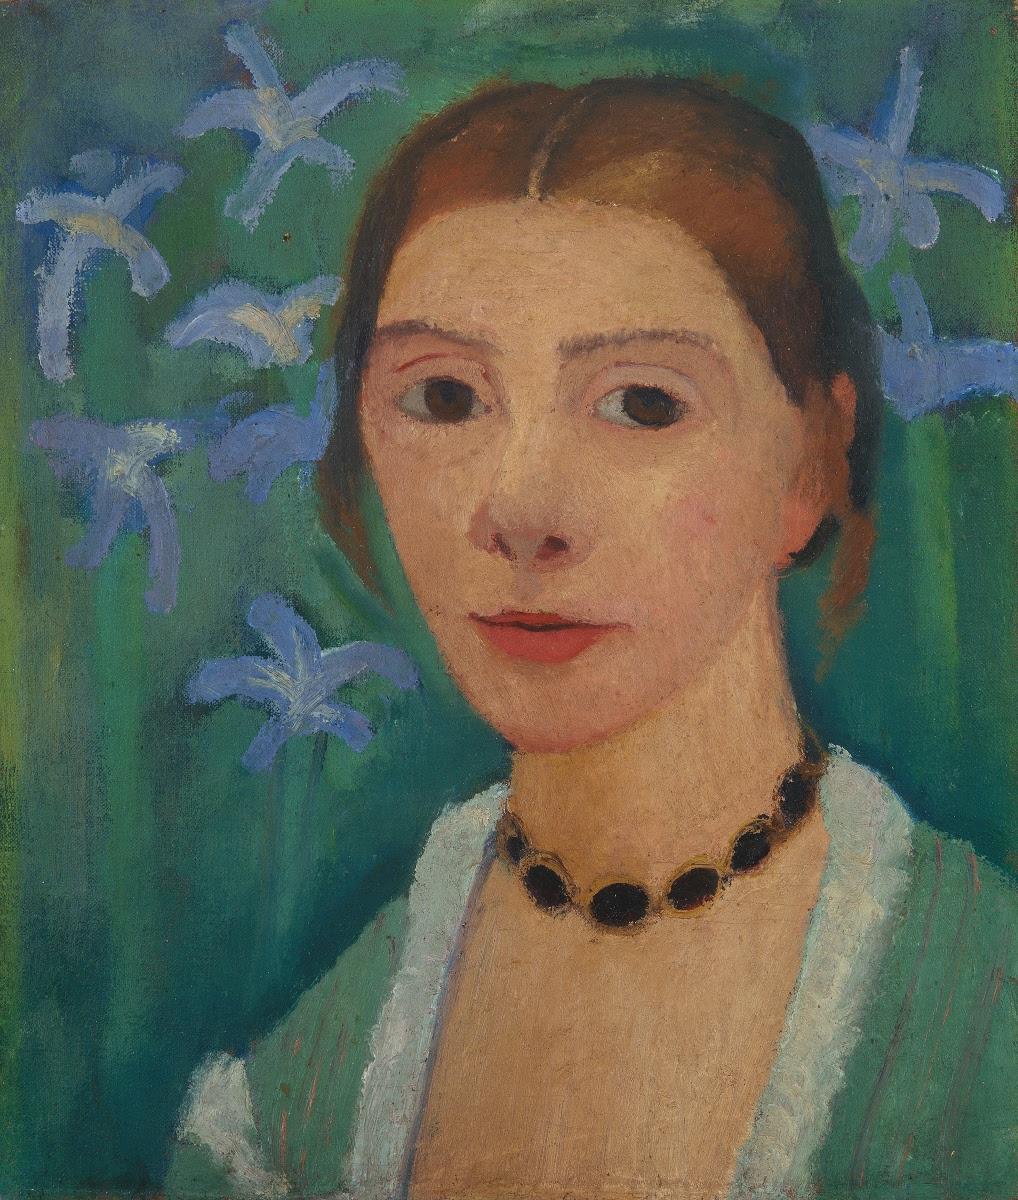 Paula Modersohn-Becker, Self Portrait Before a Green Background with Blue Iris